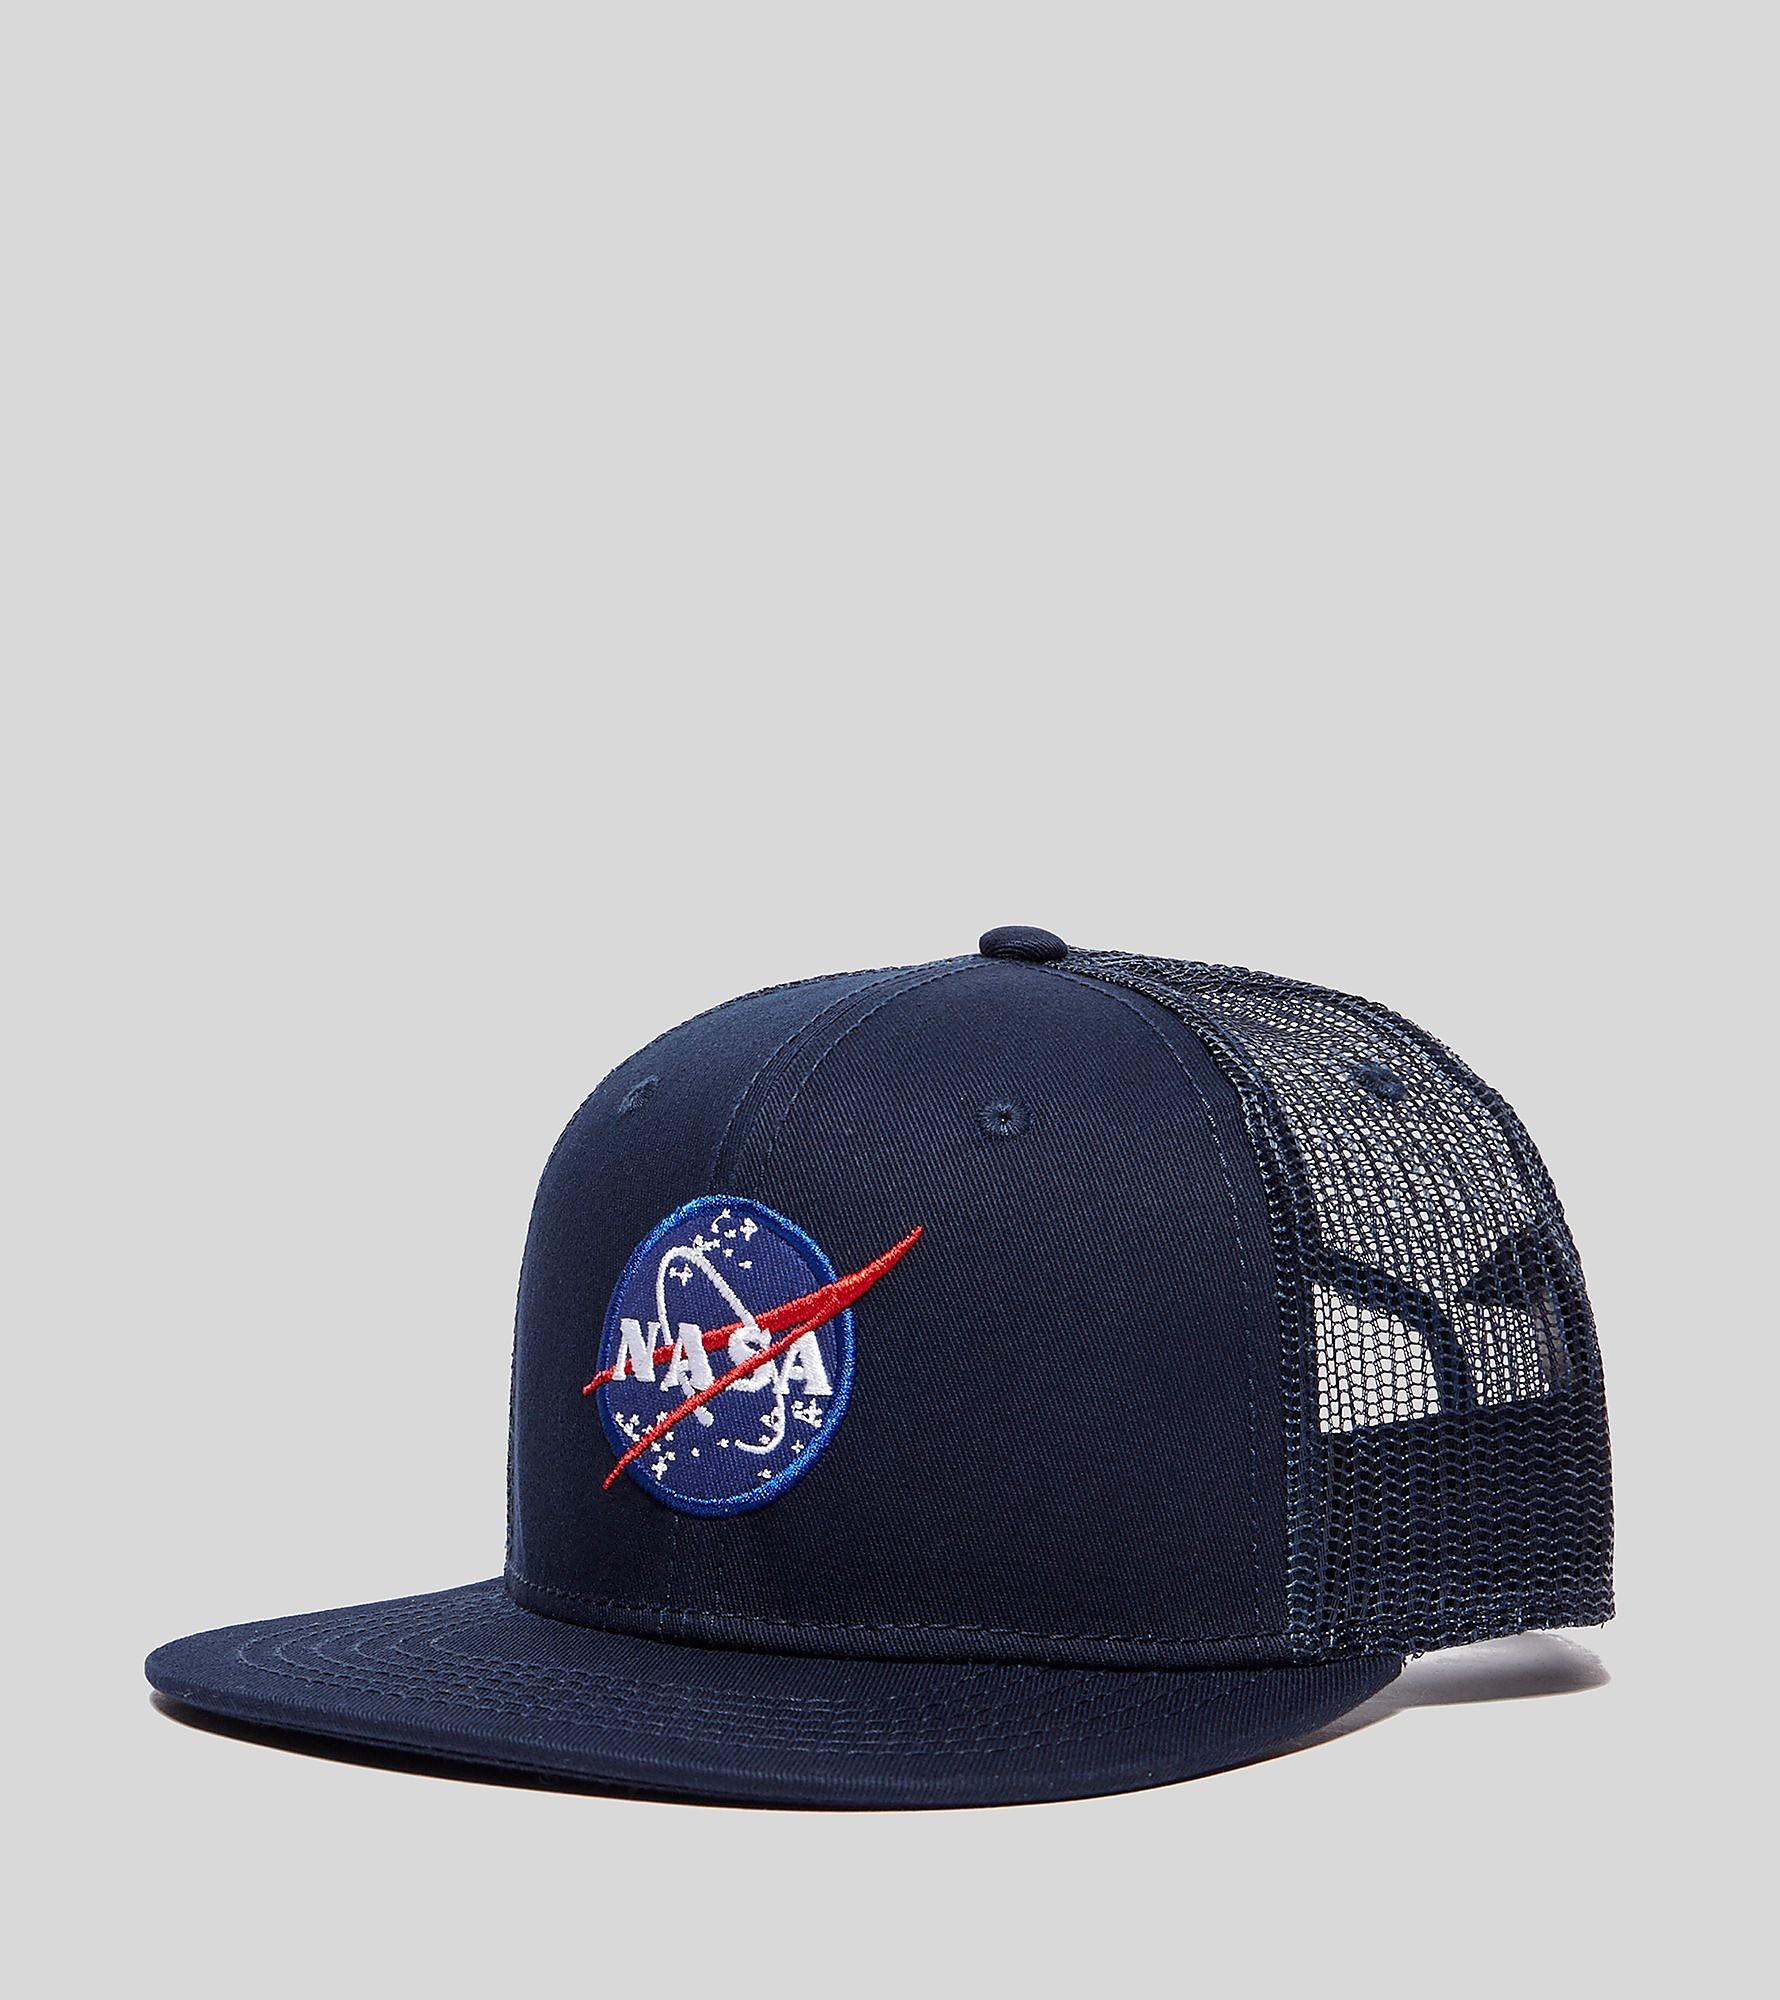 Alpha Industries Nasa Trucker Cap, azul